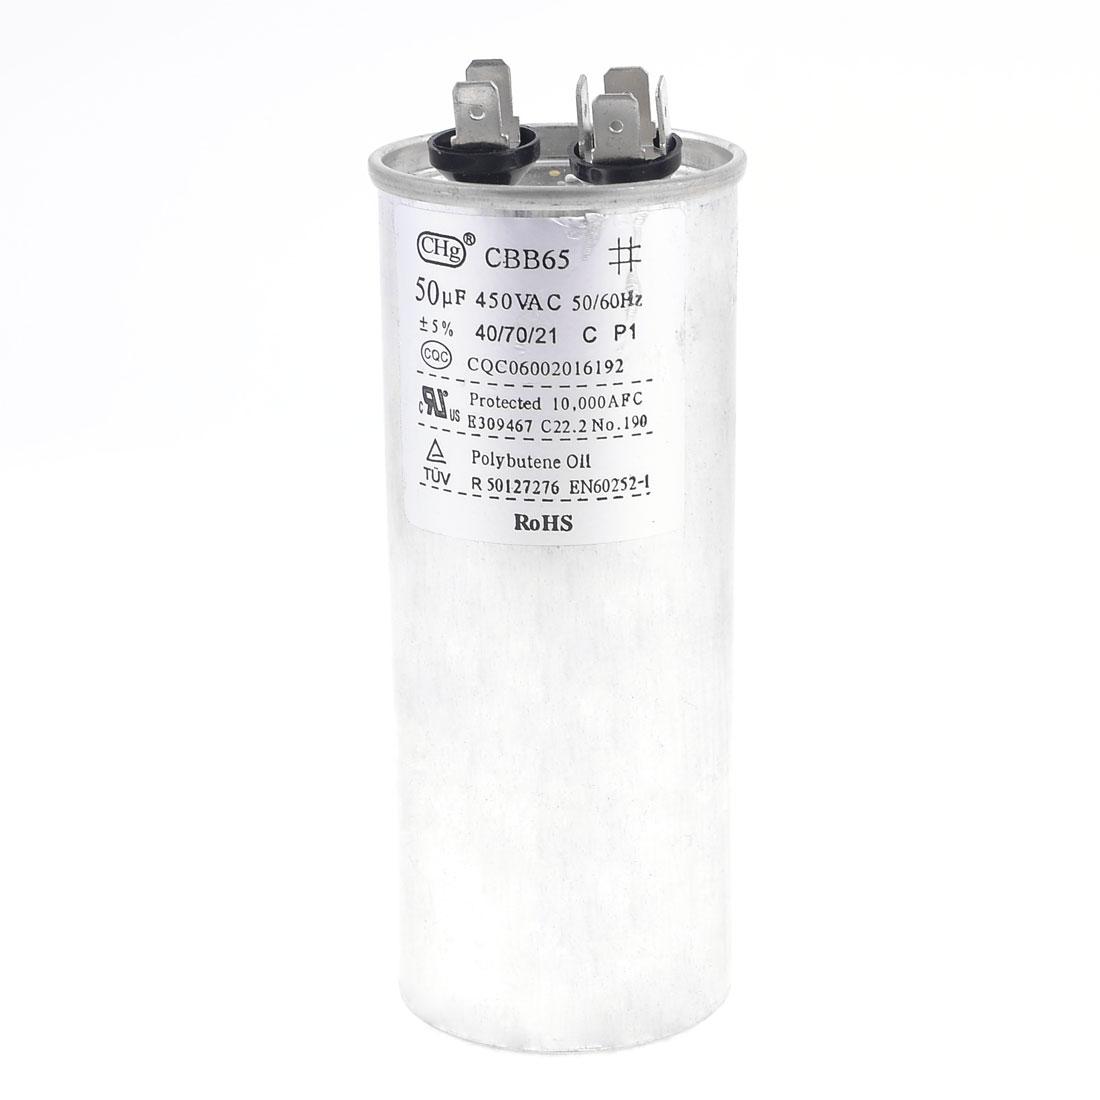 CBB65 Polypropylene Film Lug Terminals Motor Capacitor 450VAC 50uF 5%